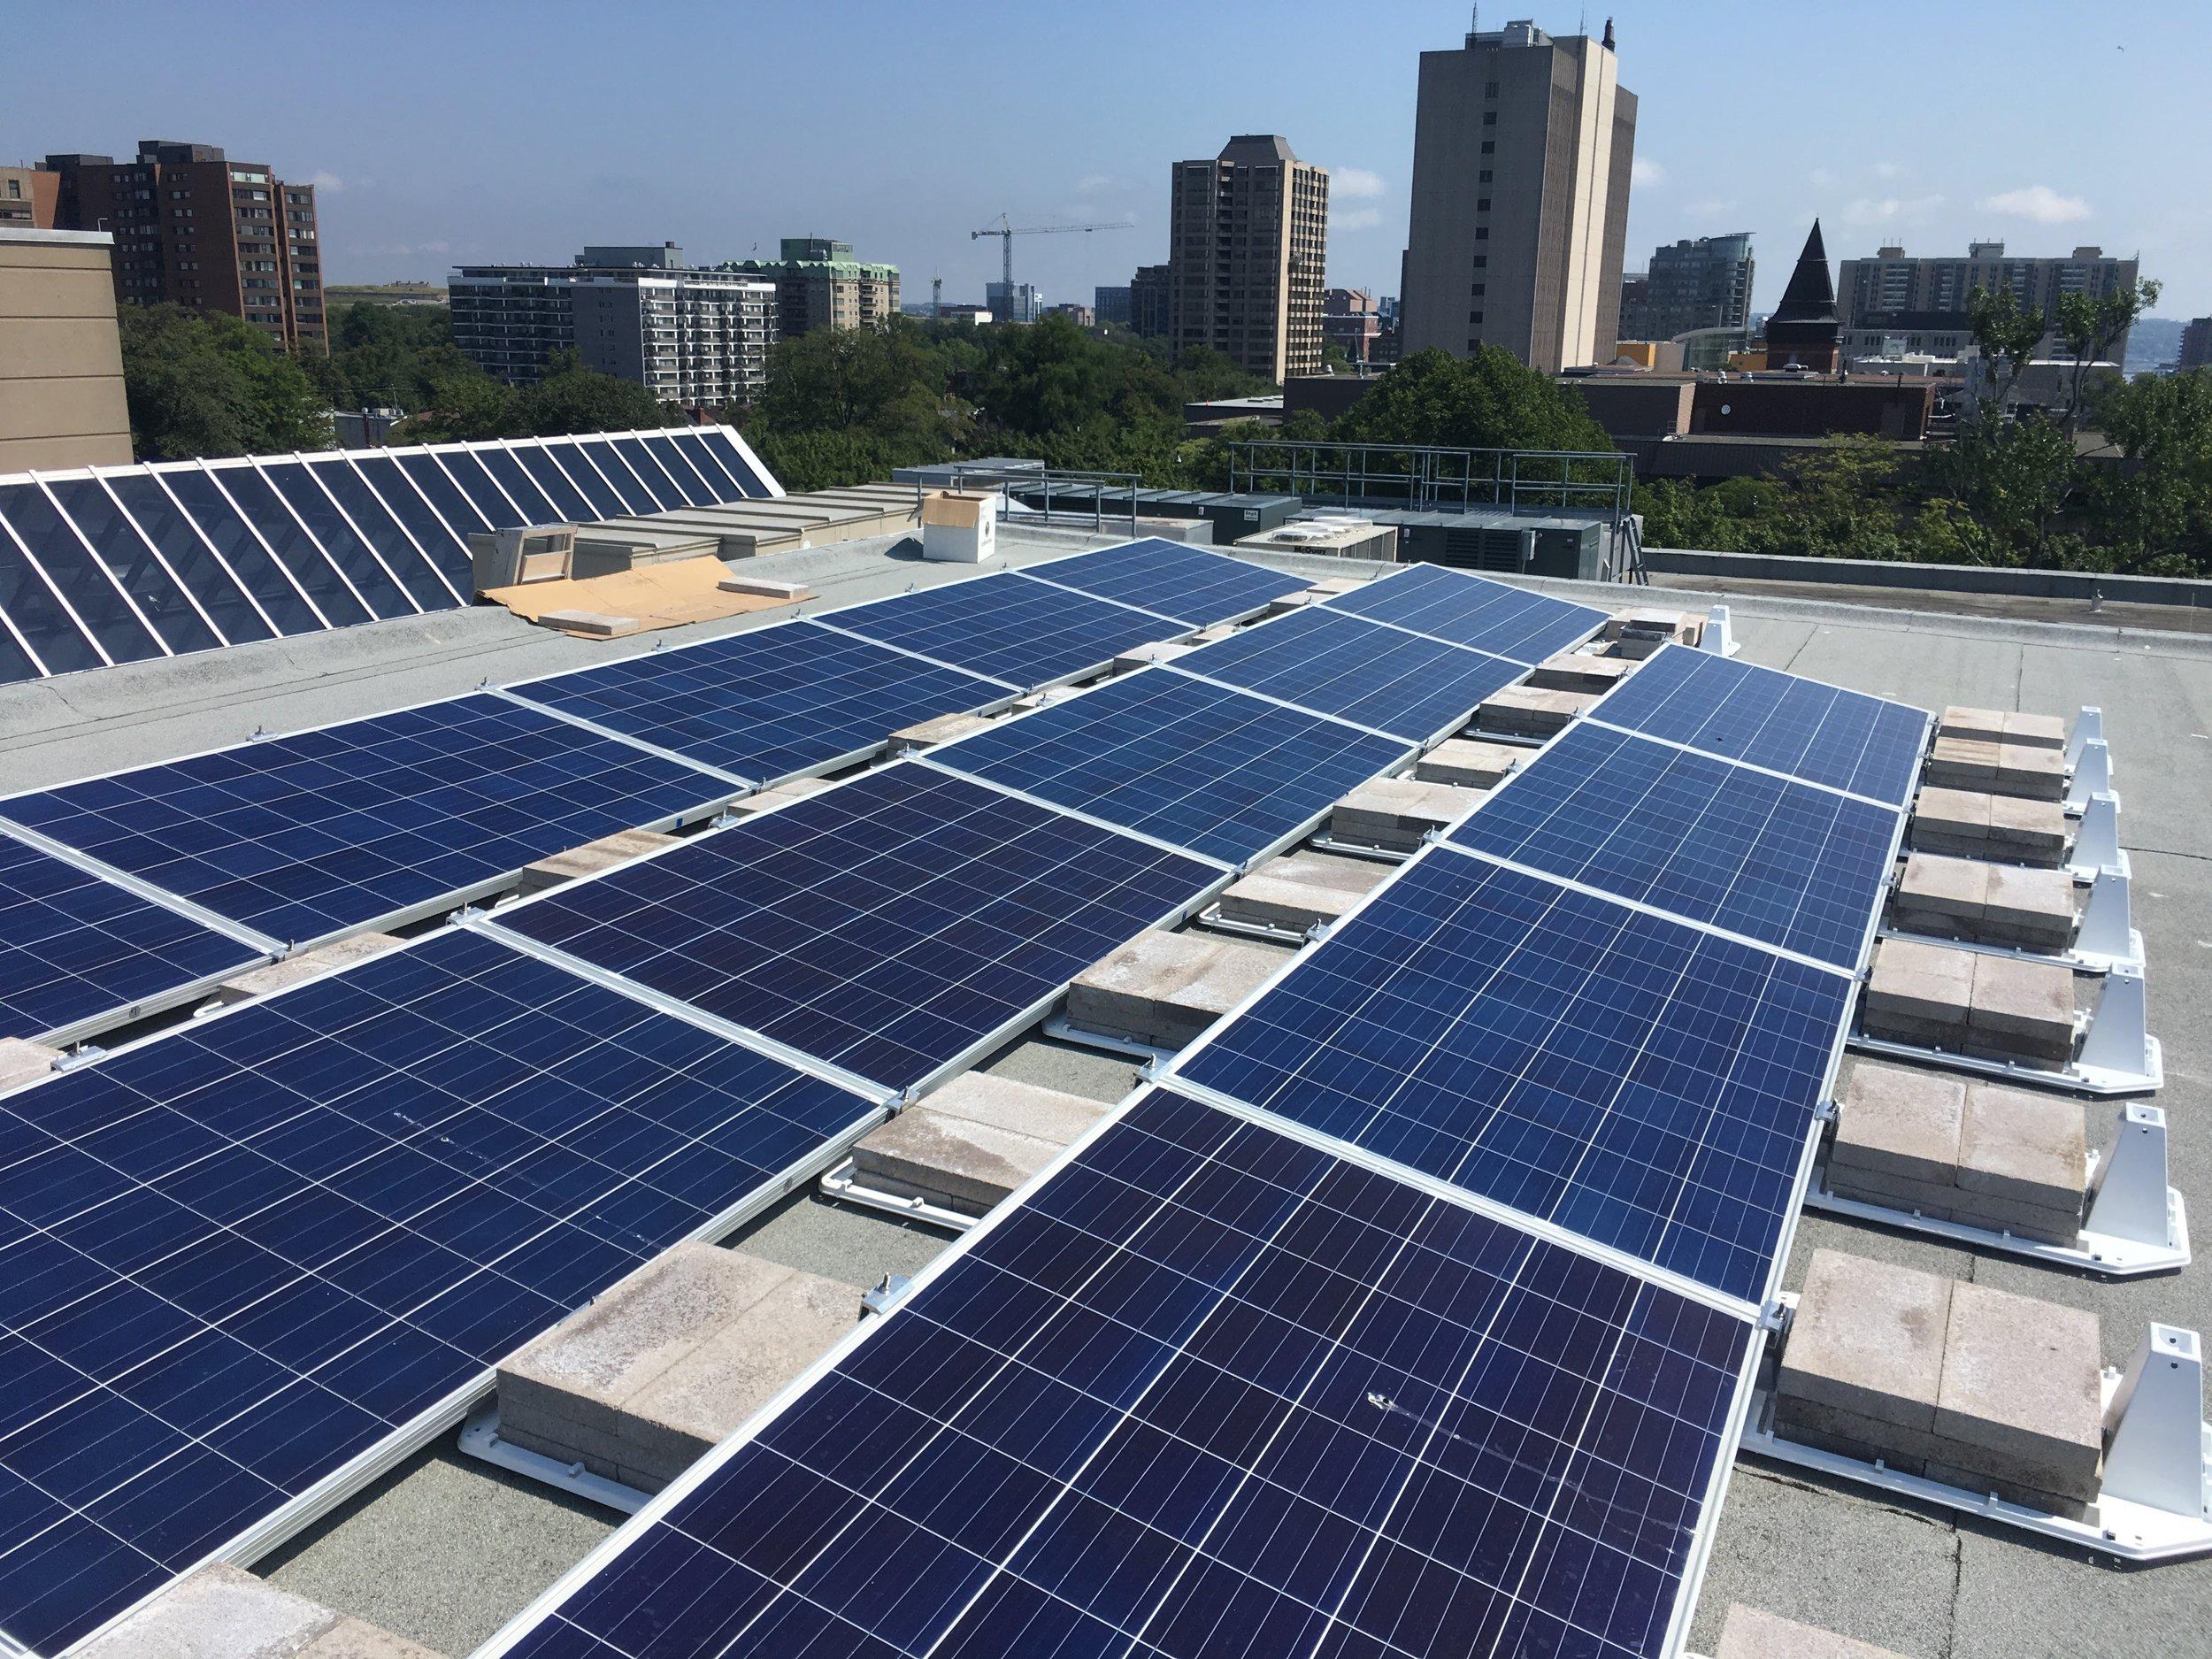 Dalhousie University   Schulich School of Law (3.44 kW solar PV system)